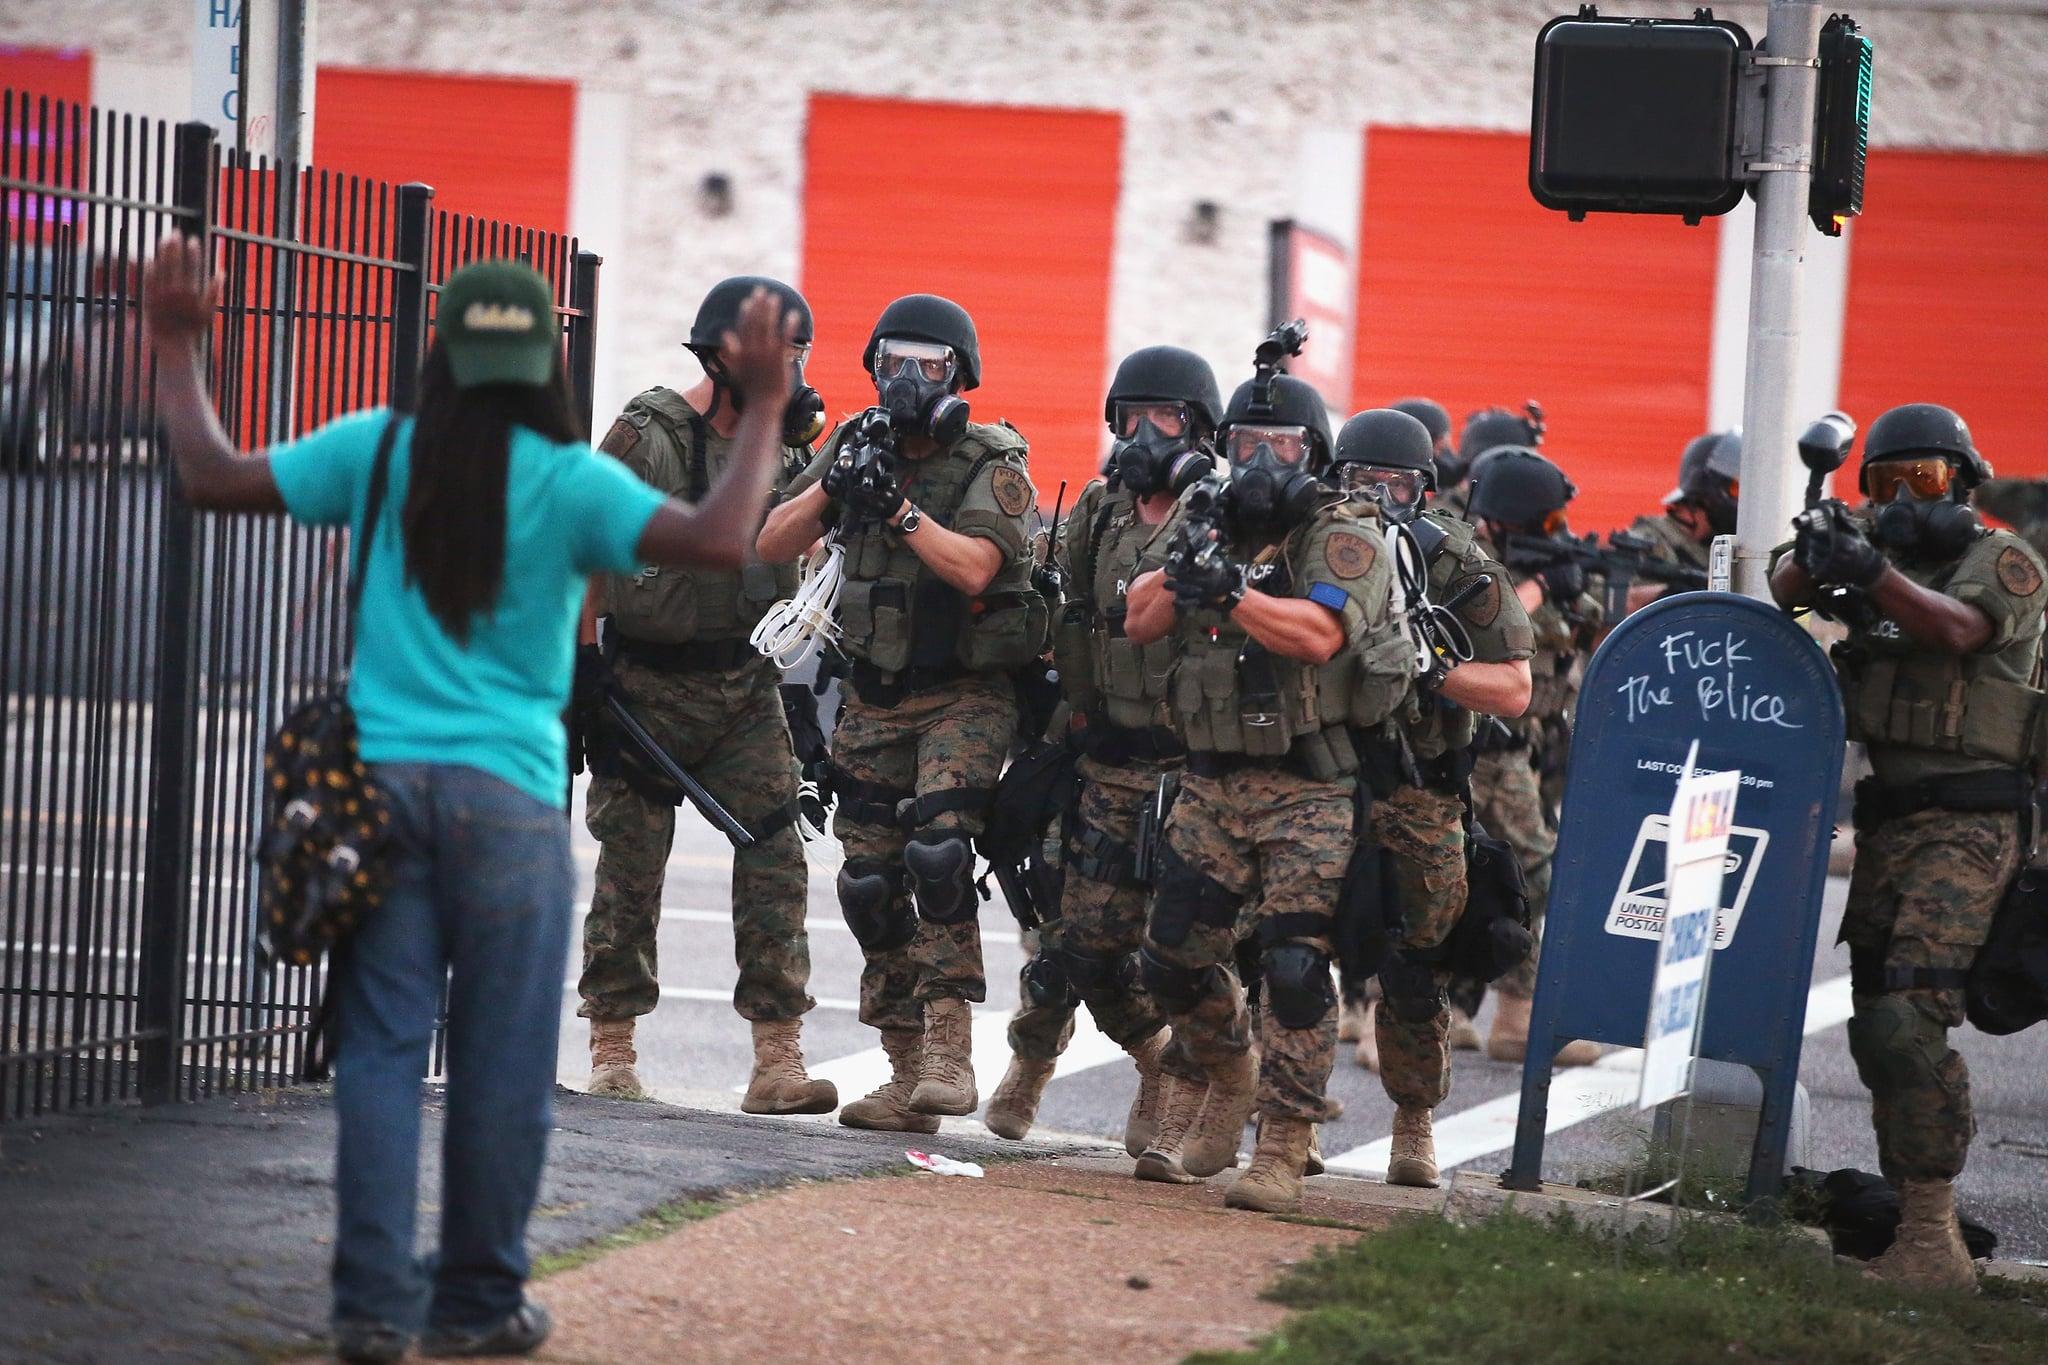 A woman encountered armed police on a Ferguson, MO, street.